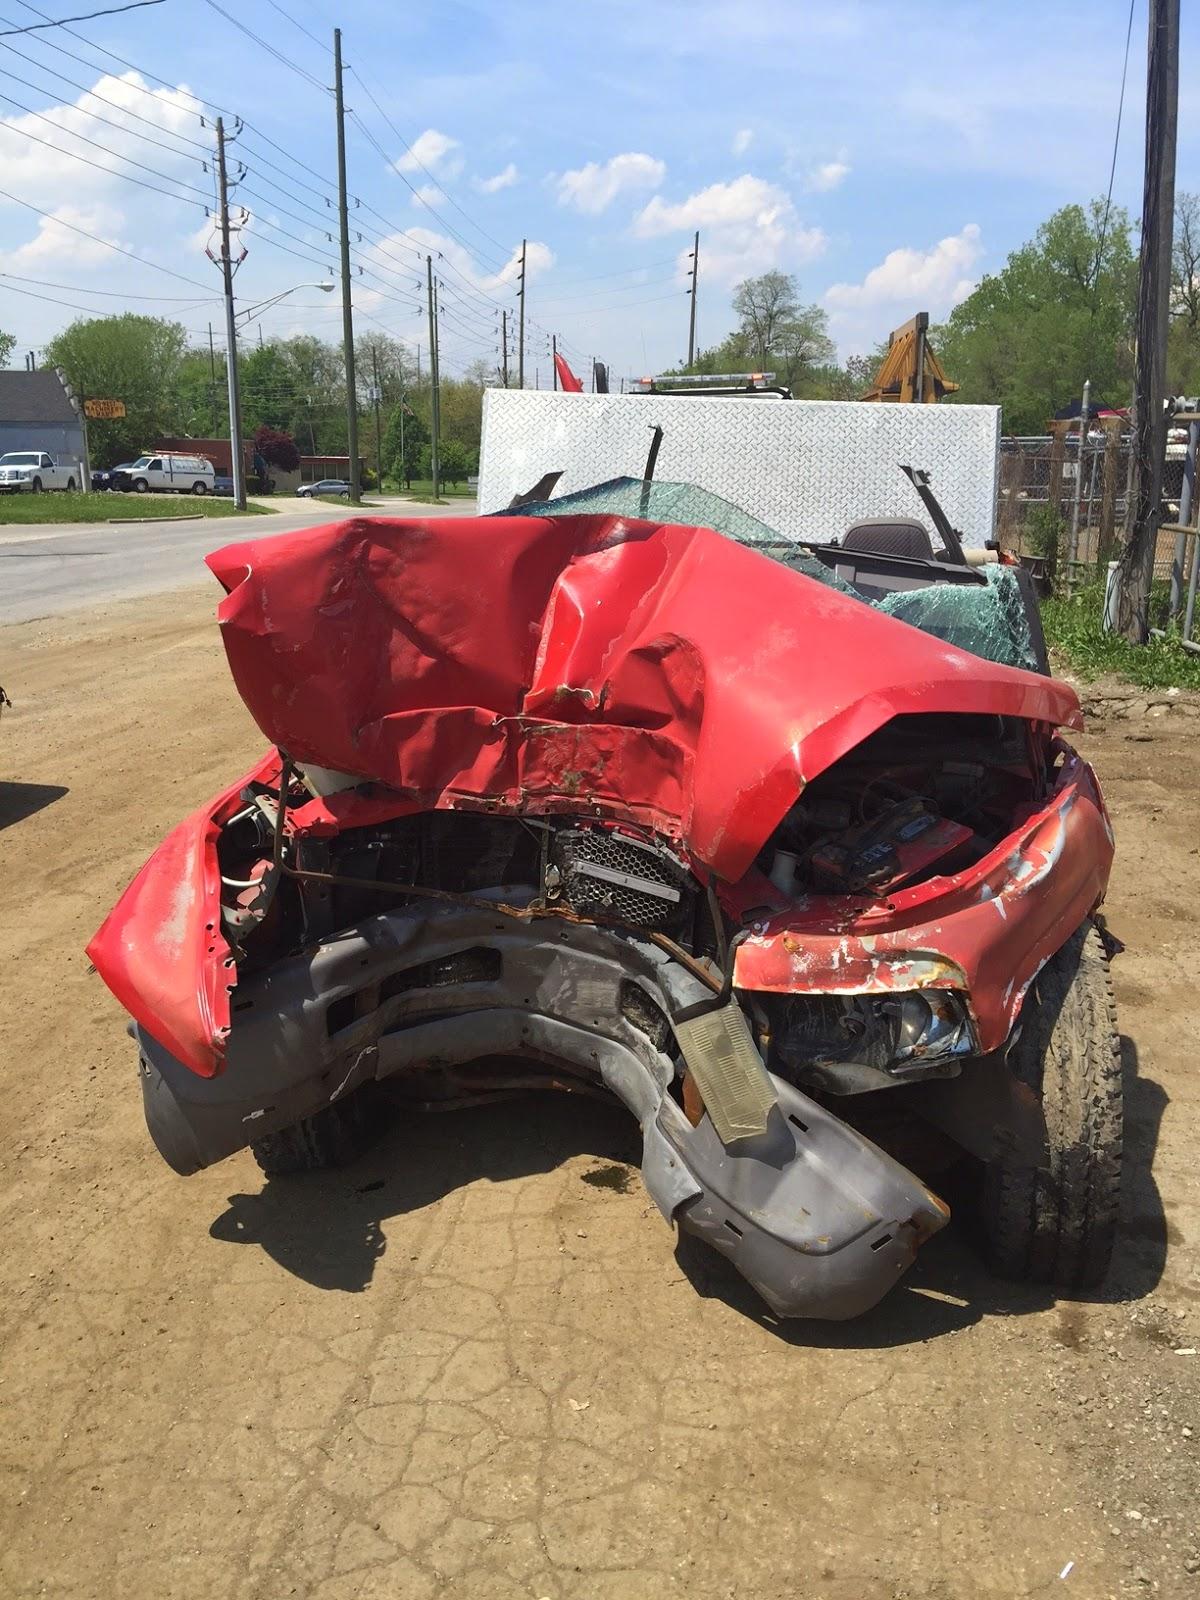 Junk Cars Indianapolis: Be Careful Indianapolis